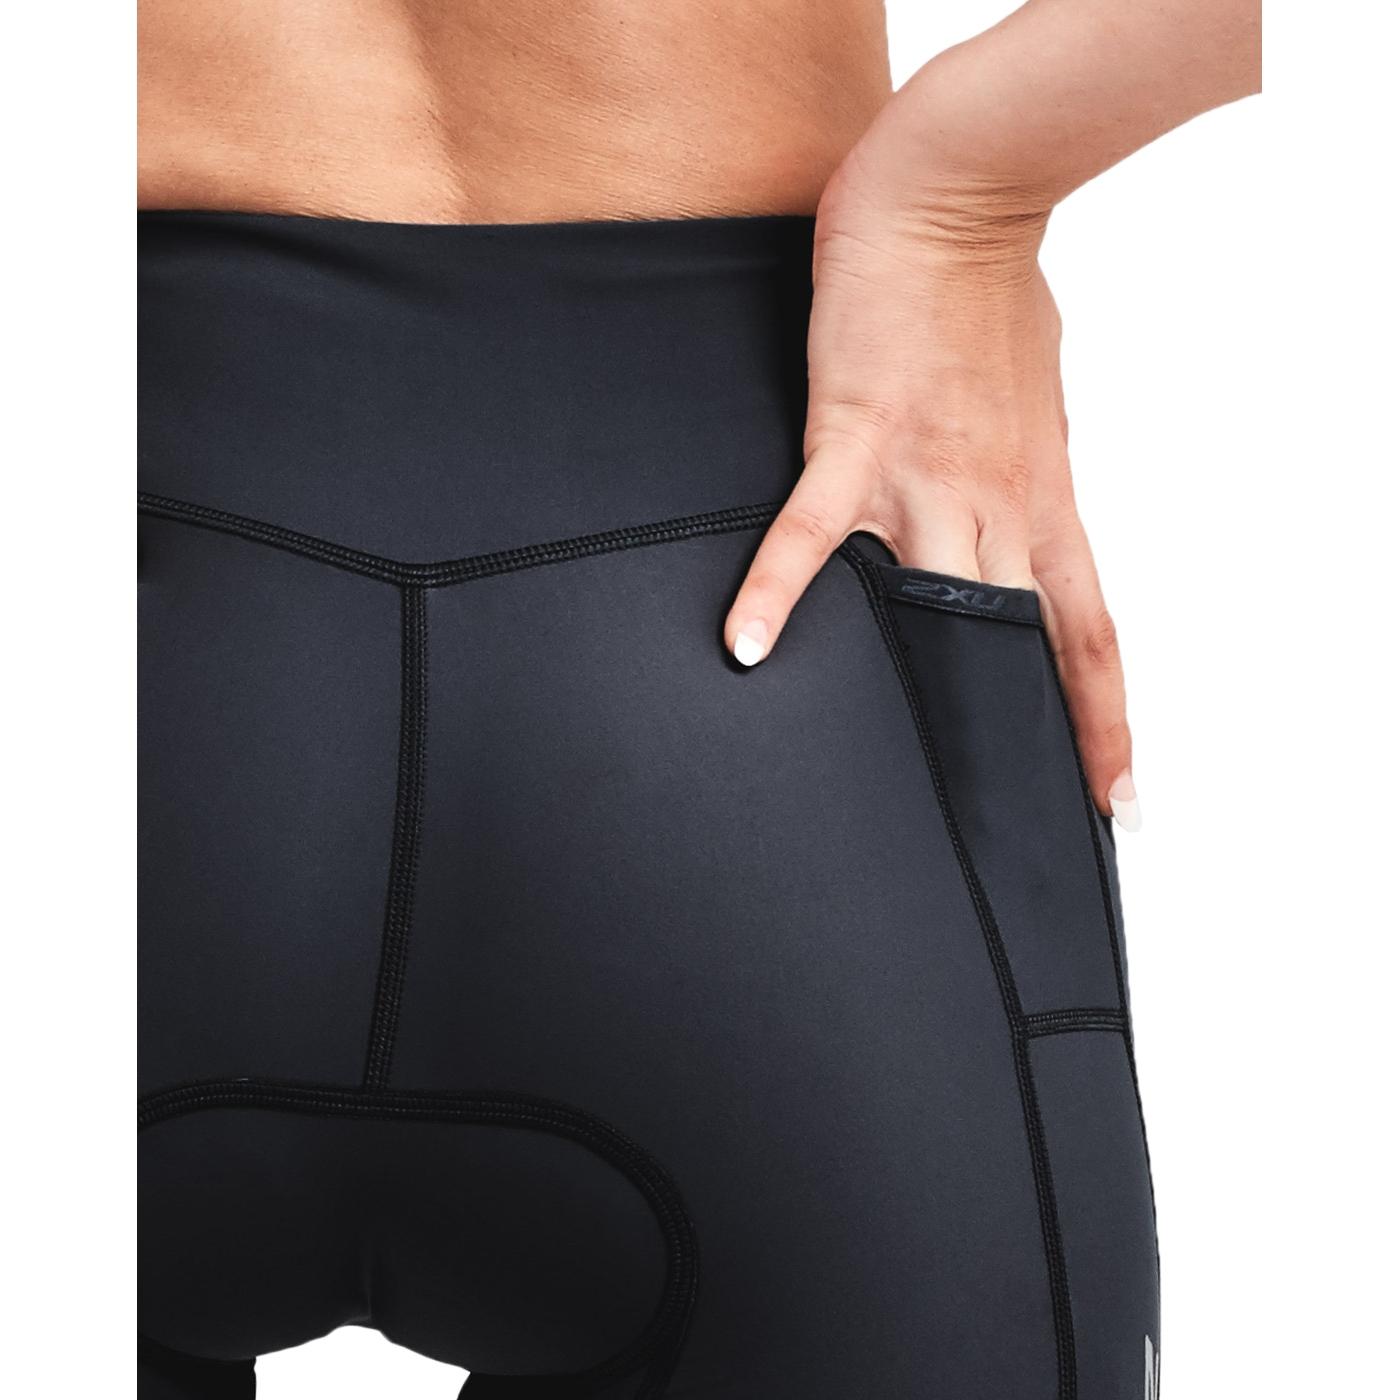 "Imagen de 2XU Perform Tri 7"" Pantalon corto - black/aque mirage"